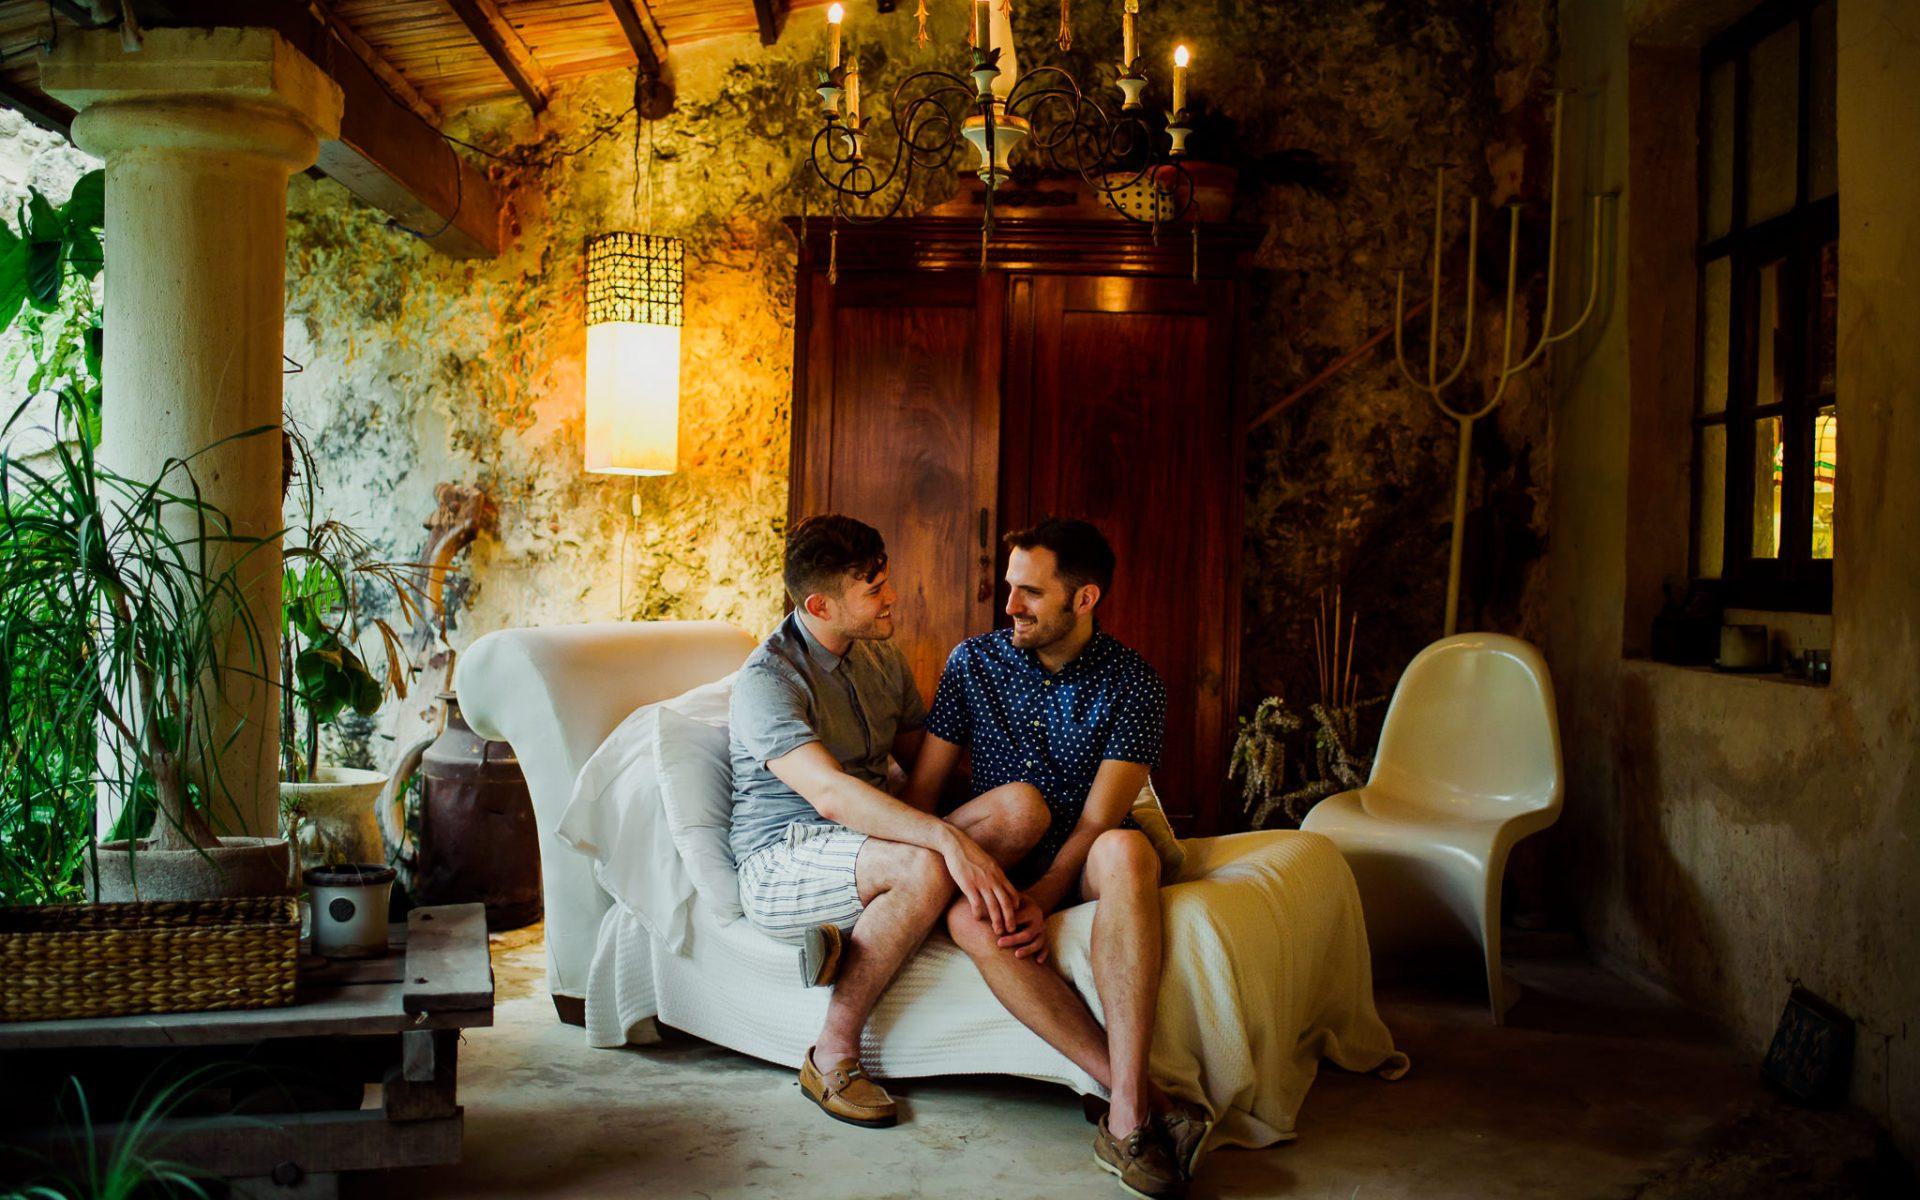 Hotel Puertas Campeche // Engagement Session: Chris & Gabe